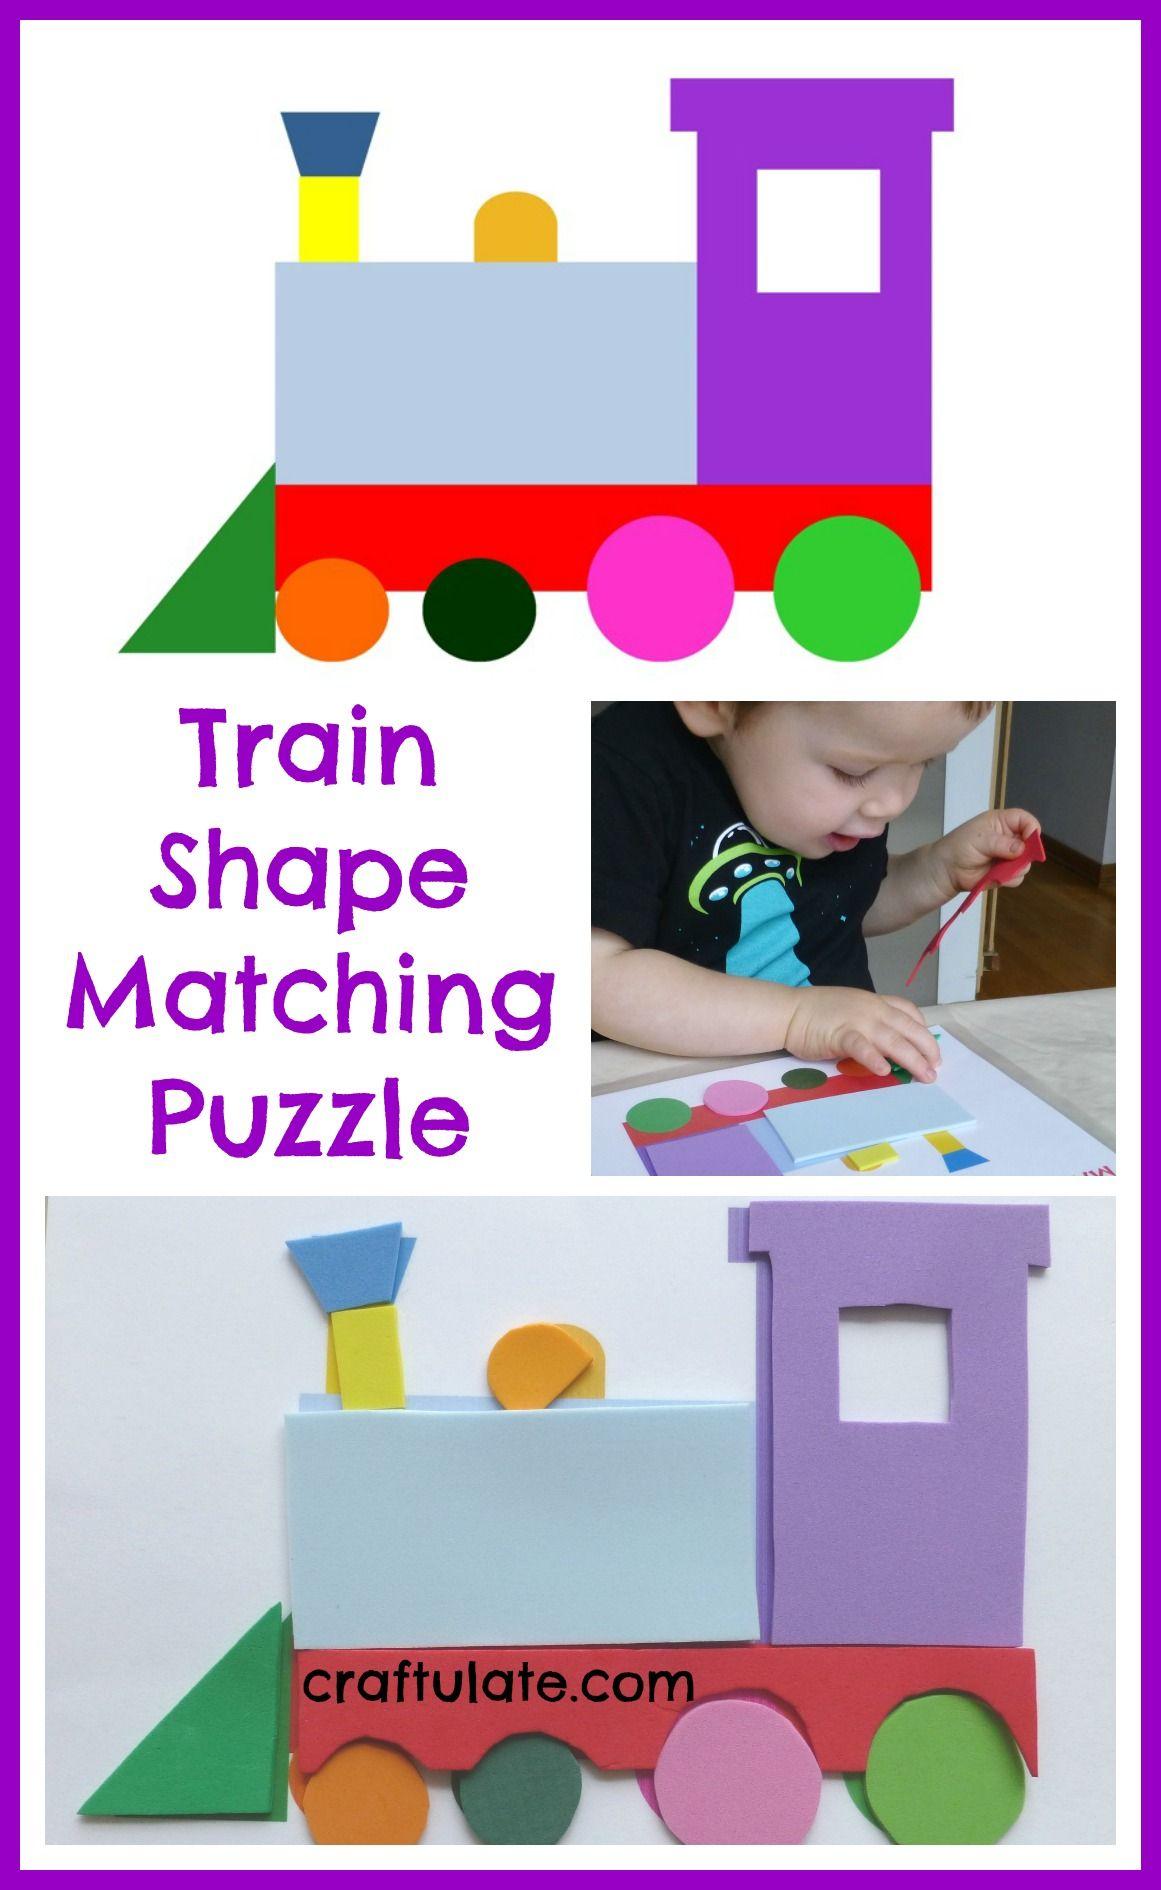 All Things Train | Lernspiele und Eisenbahn